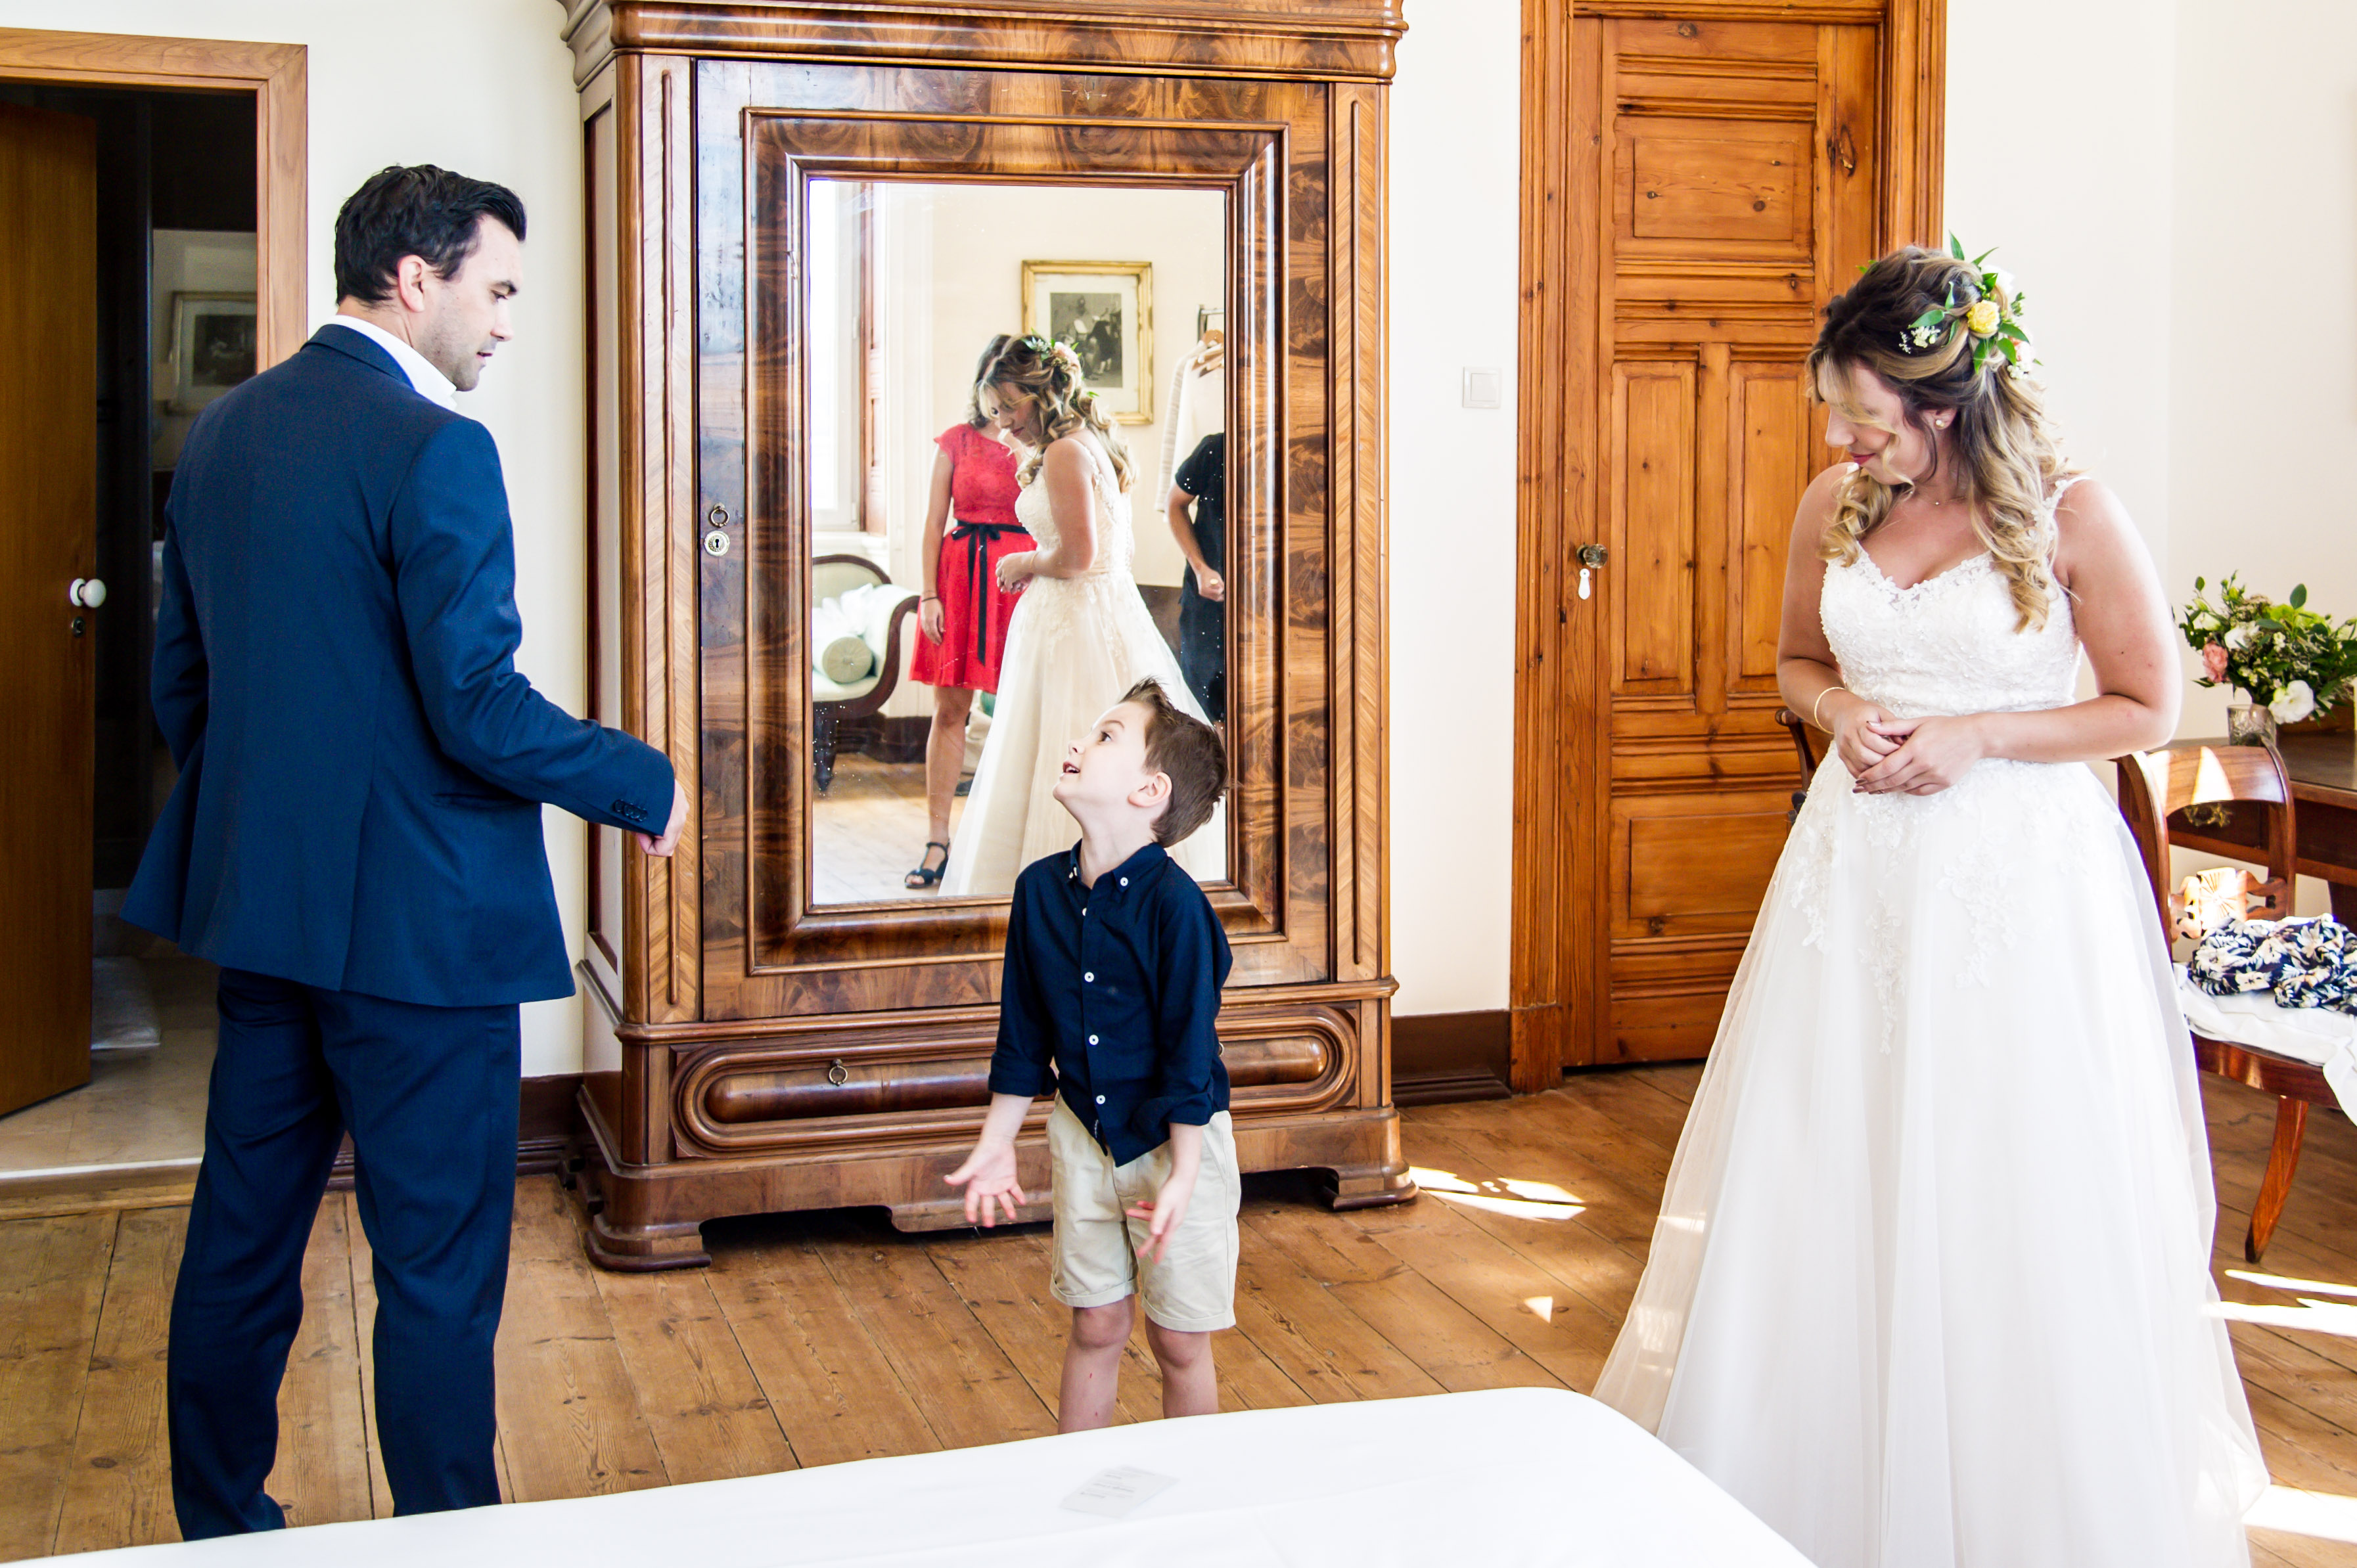 Wedding Estoril_Catia & Tobias_web-92